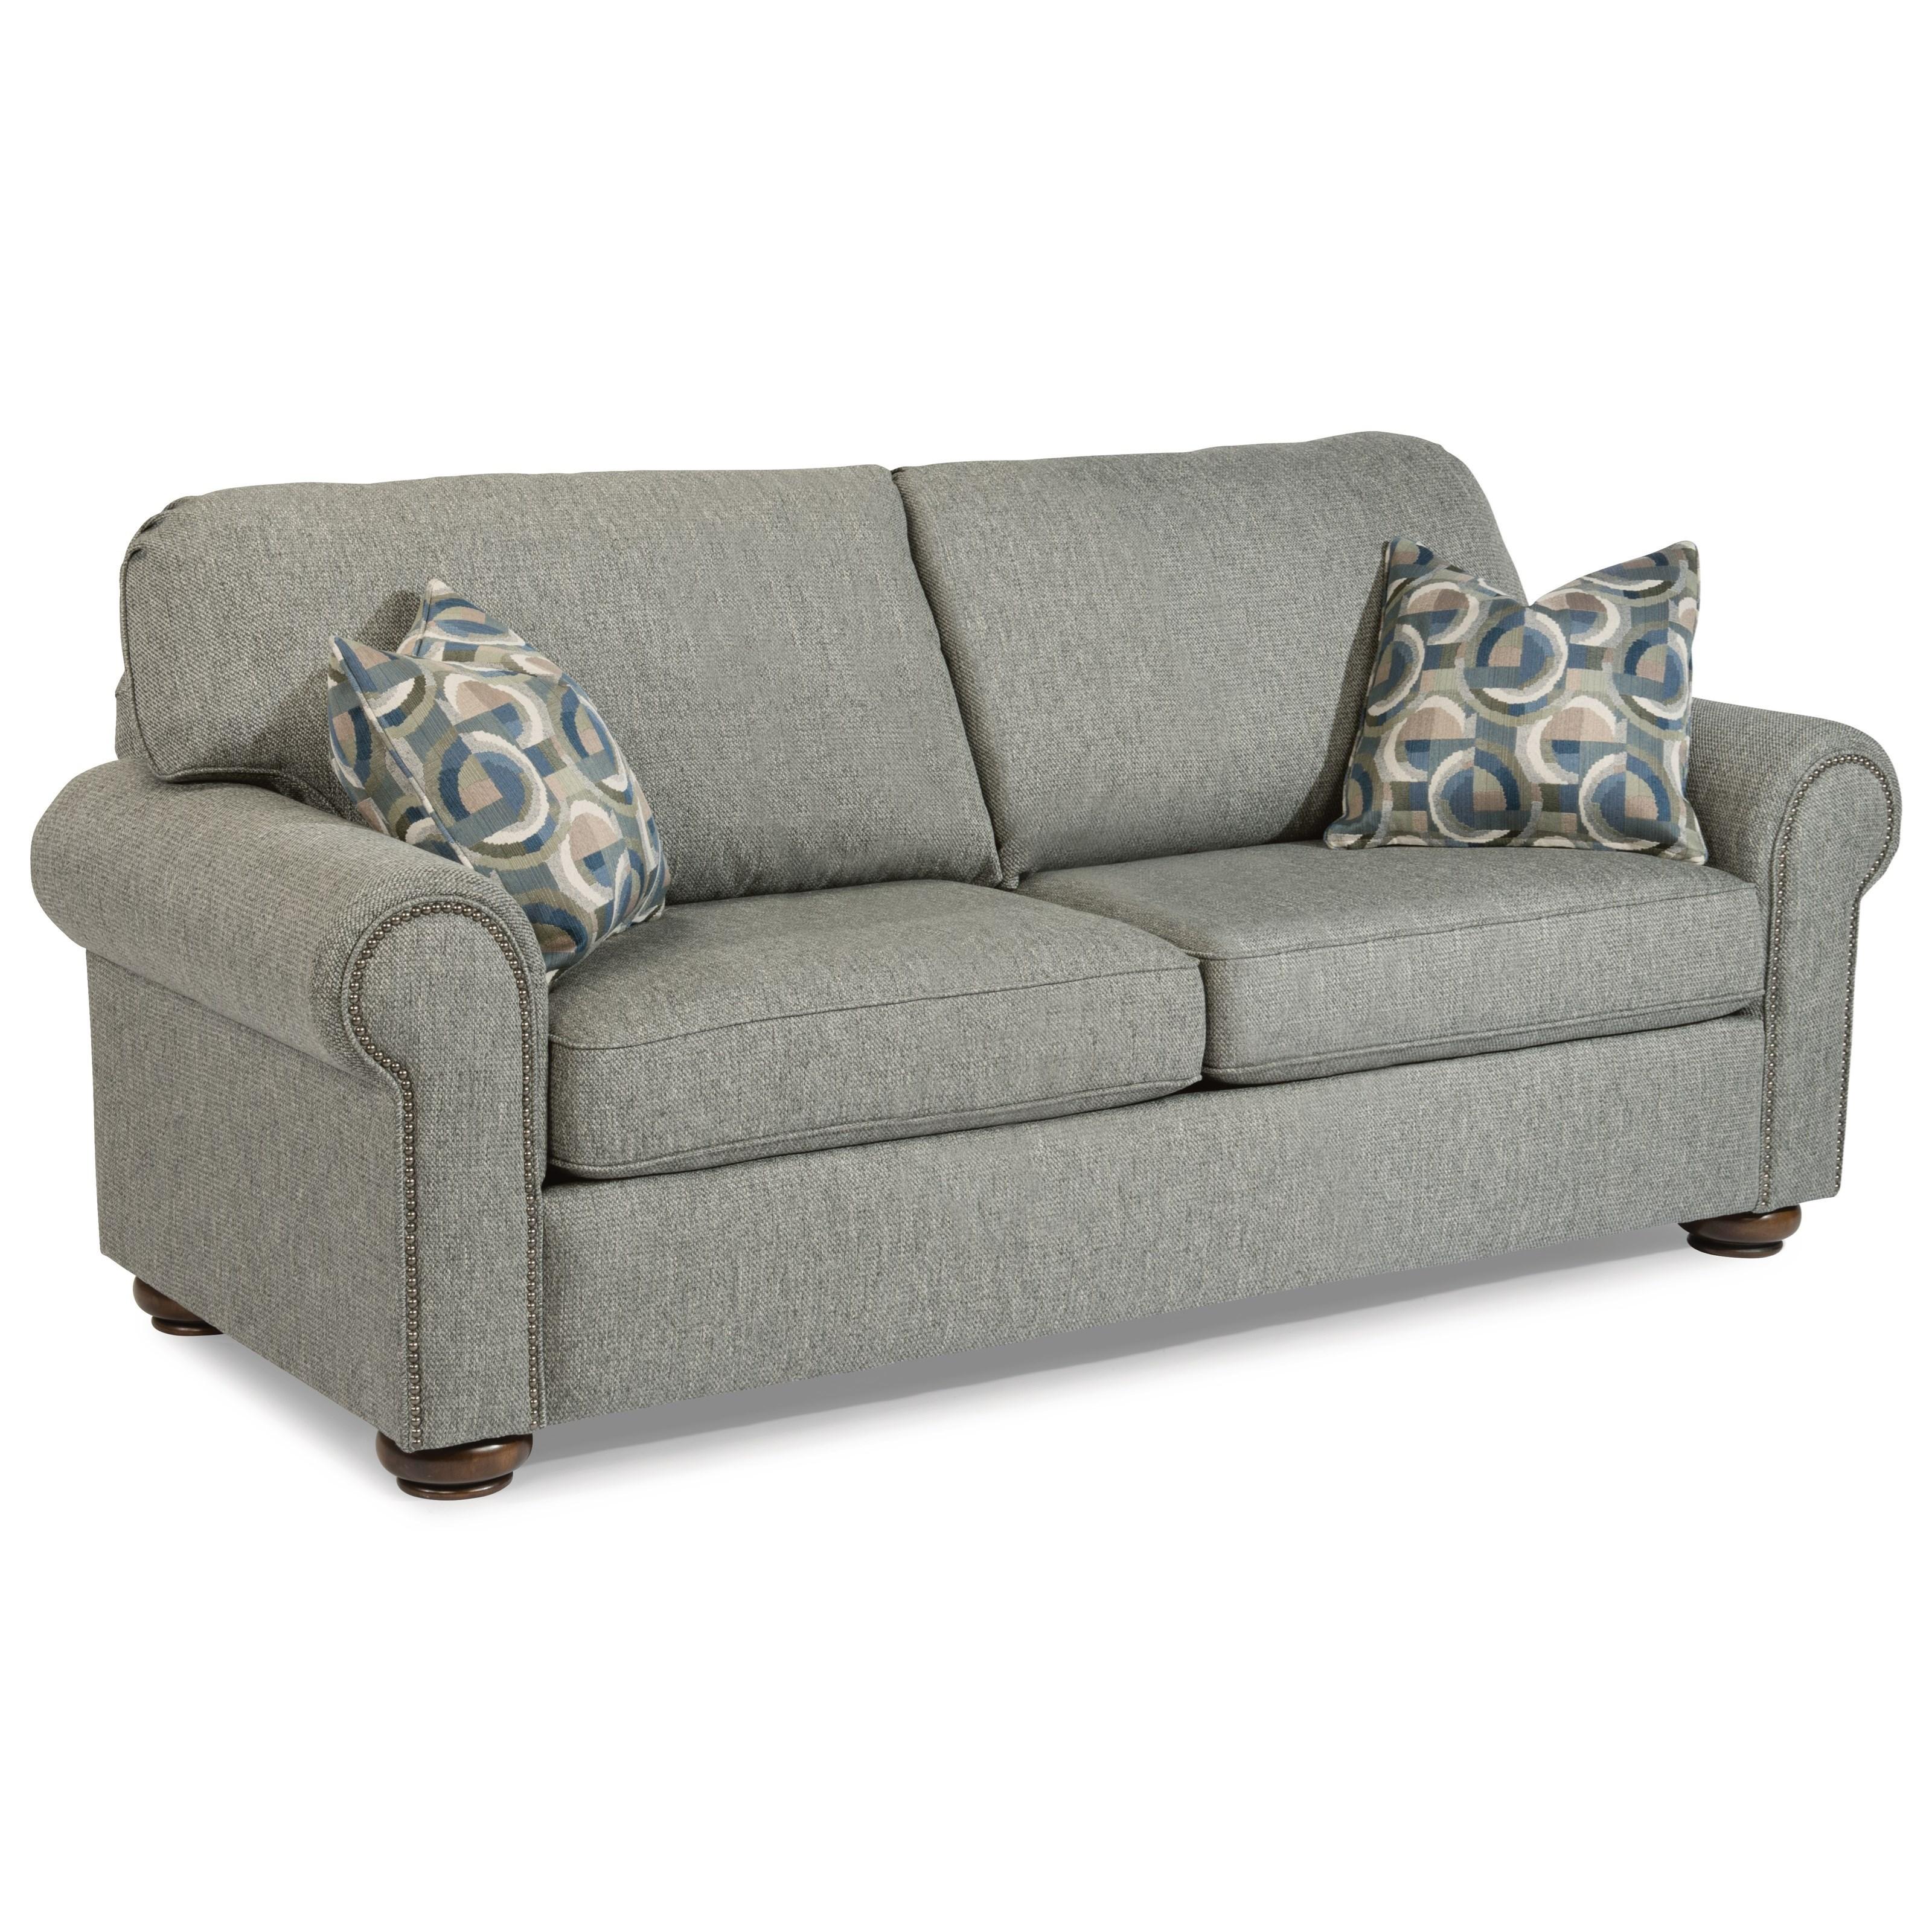 Primo Full Sleeper Sofa by Flexsteel at Crowley Furniture & Mattress